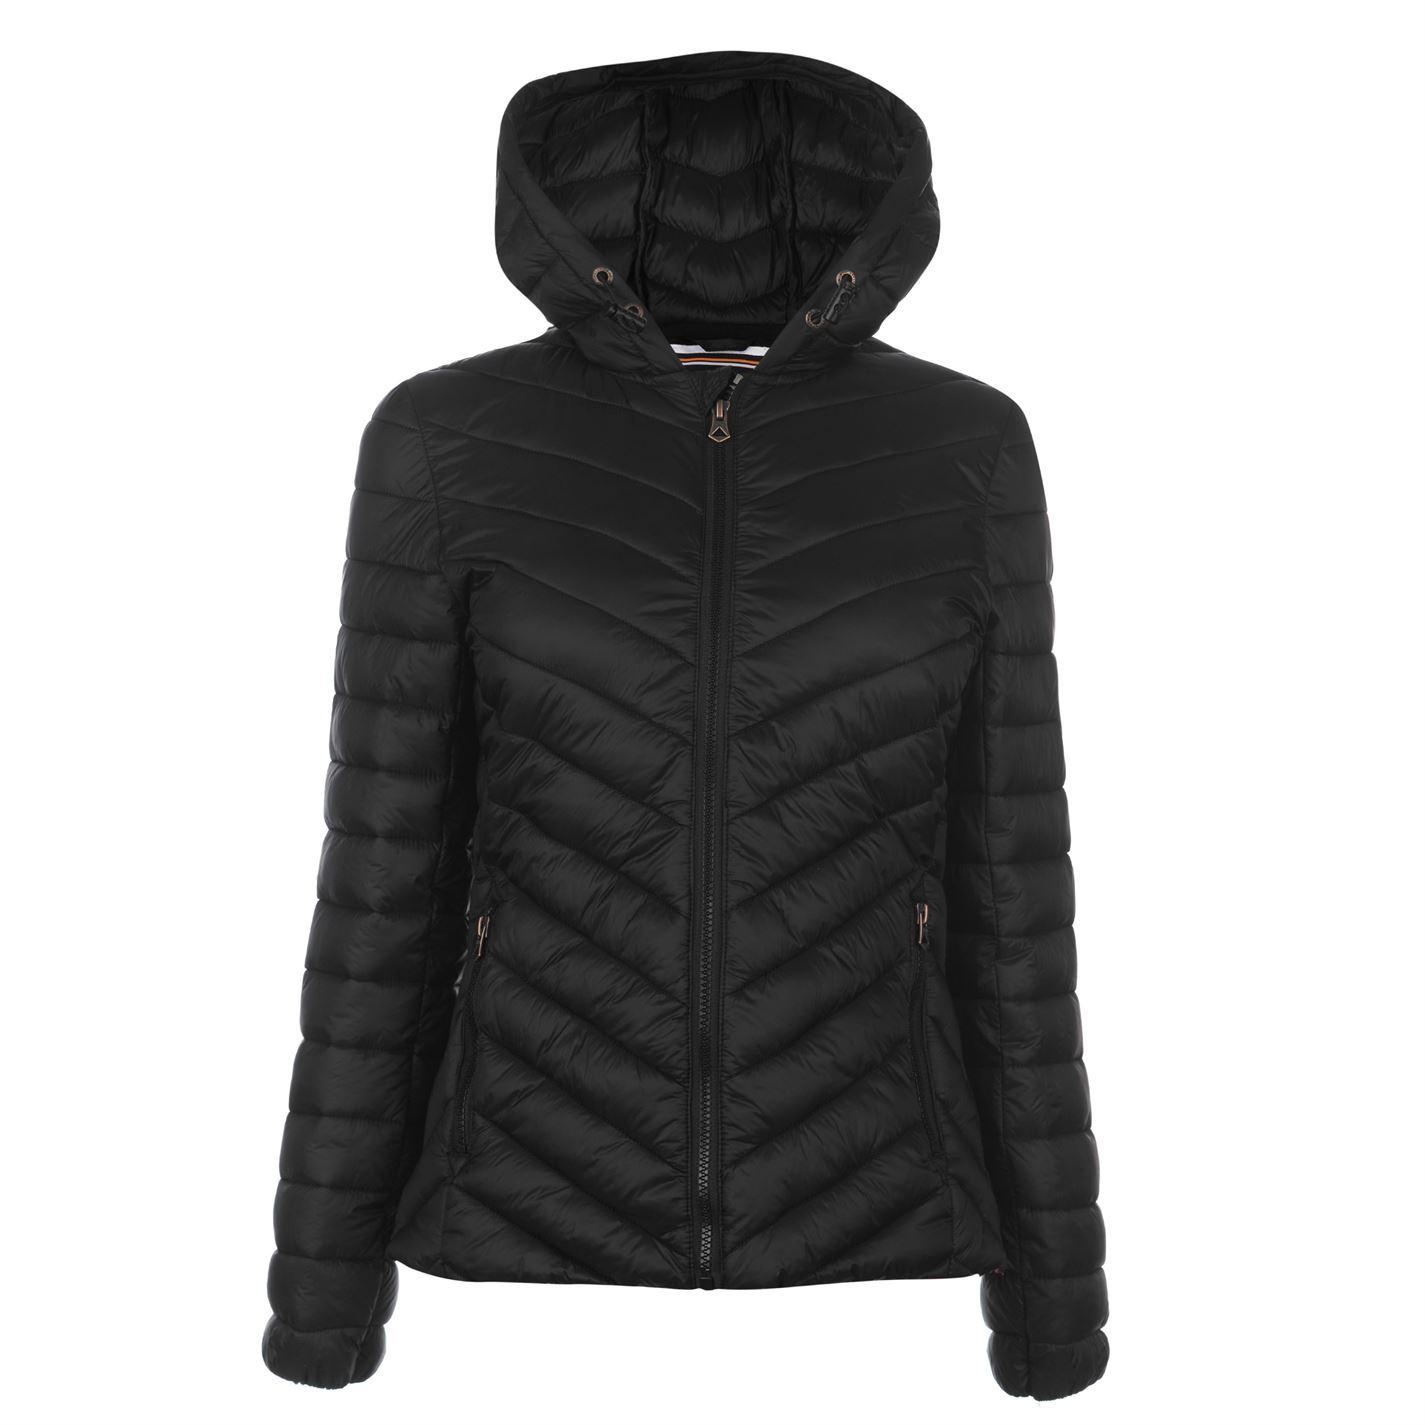 SoulCal Micro Bubble Jacket Womens Coats Outerwear